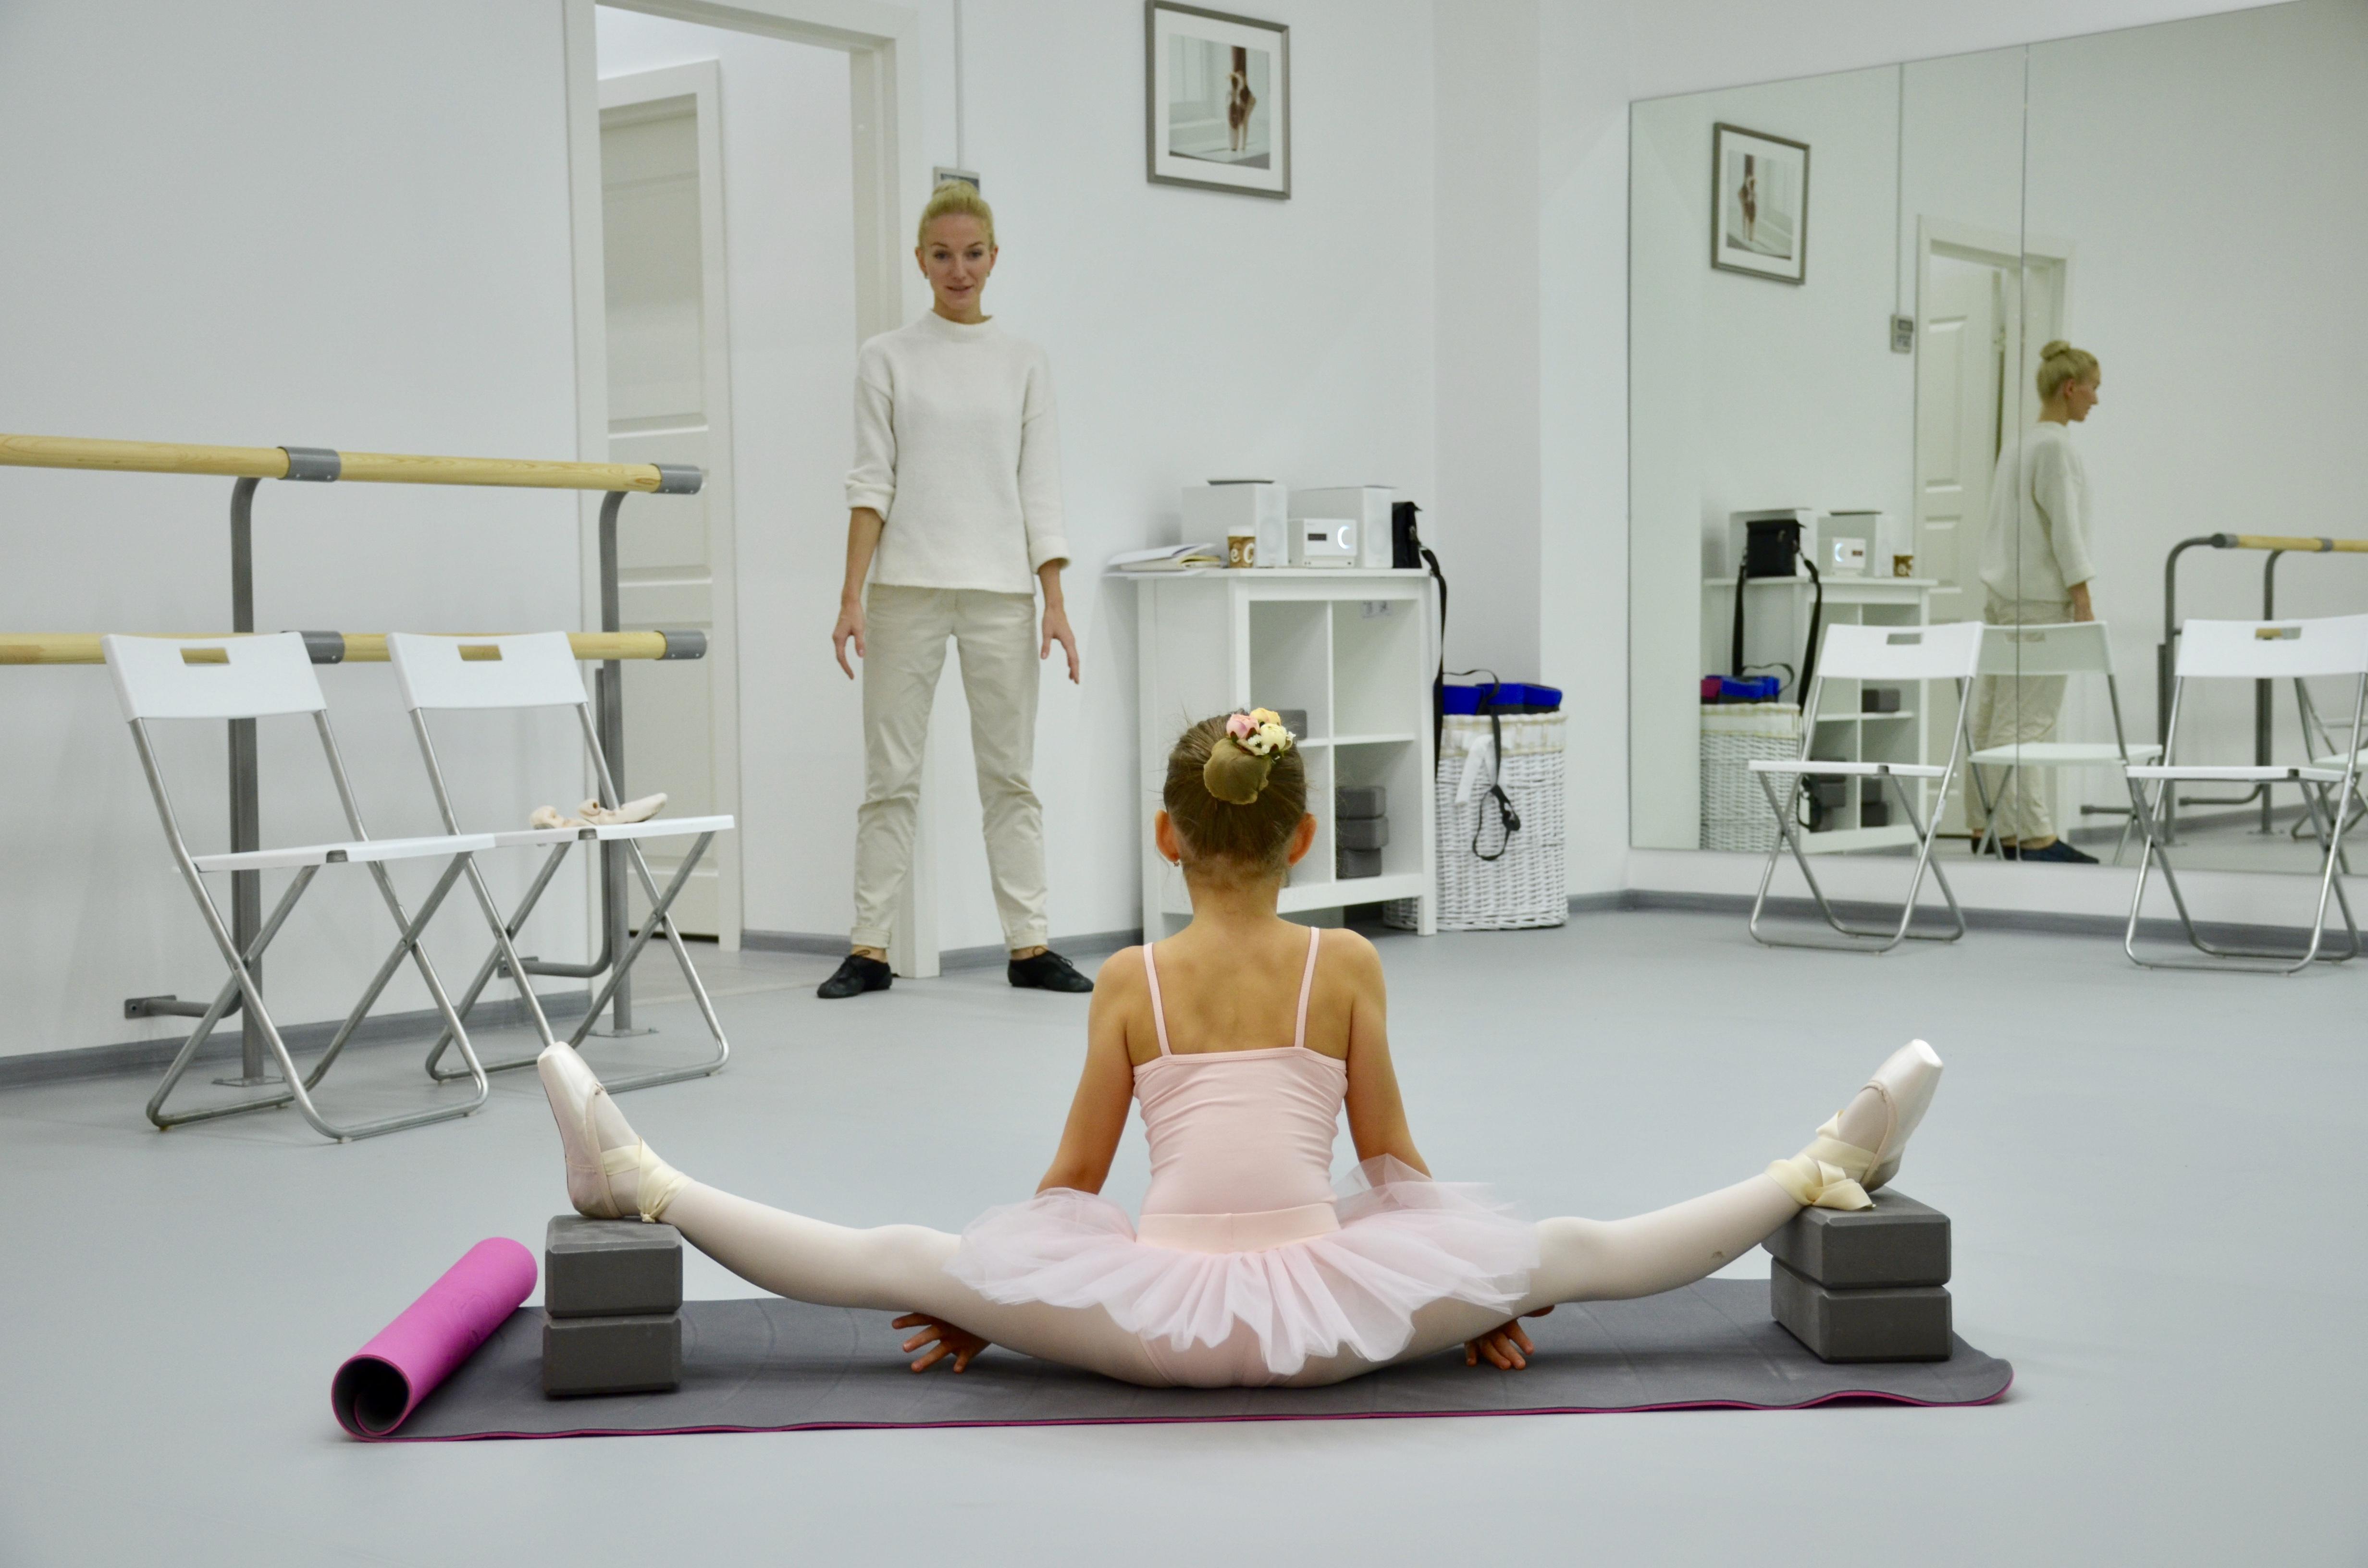 Педагог и юная балерина